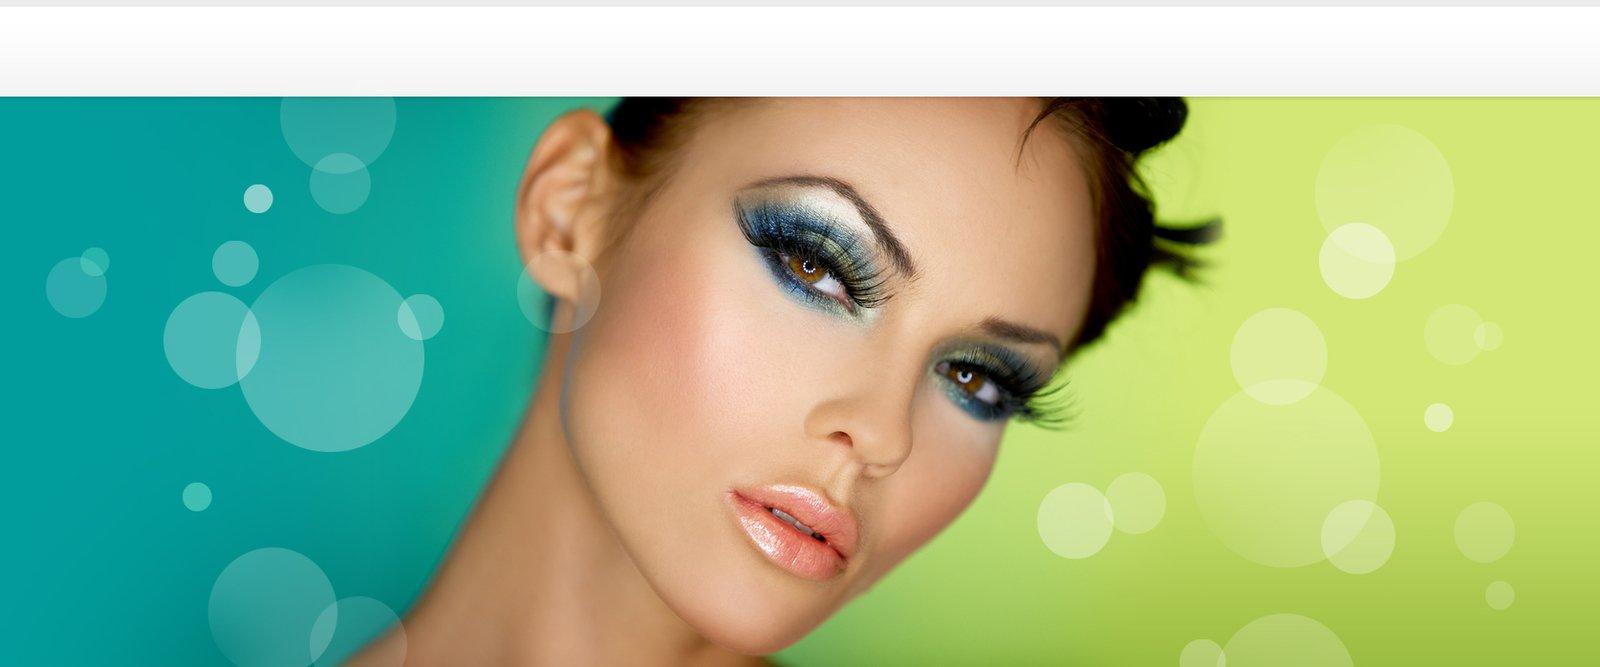 Beauty Fixx - Extreme Lashes Studio